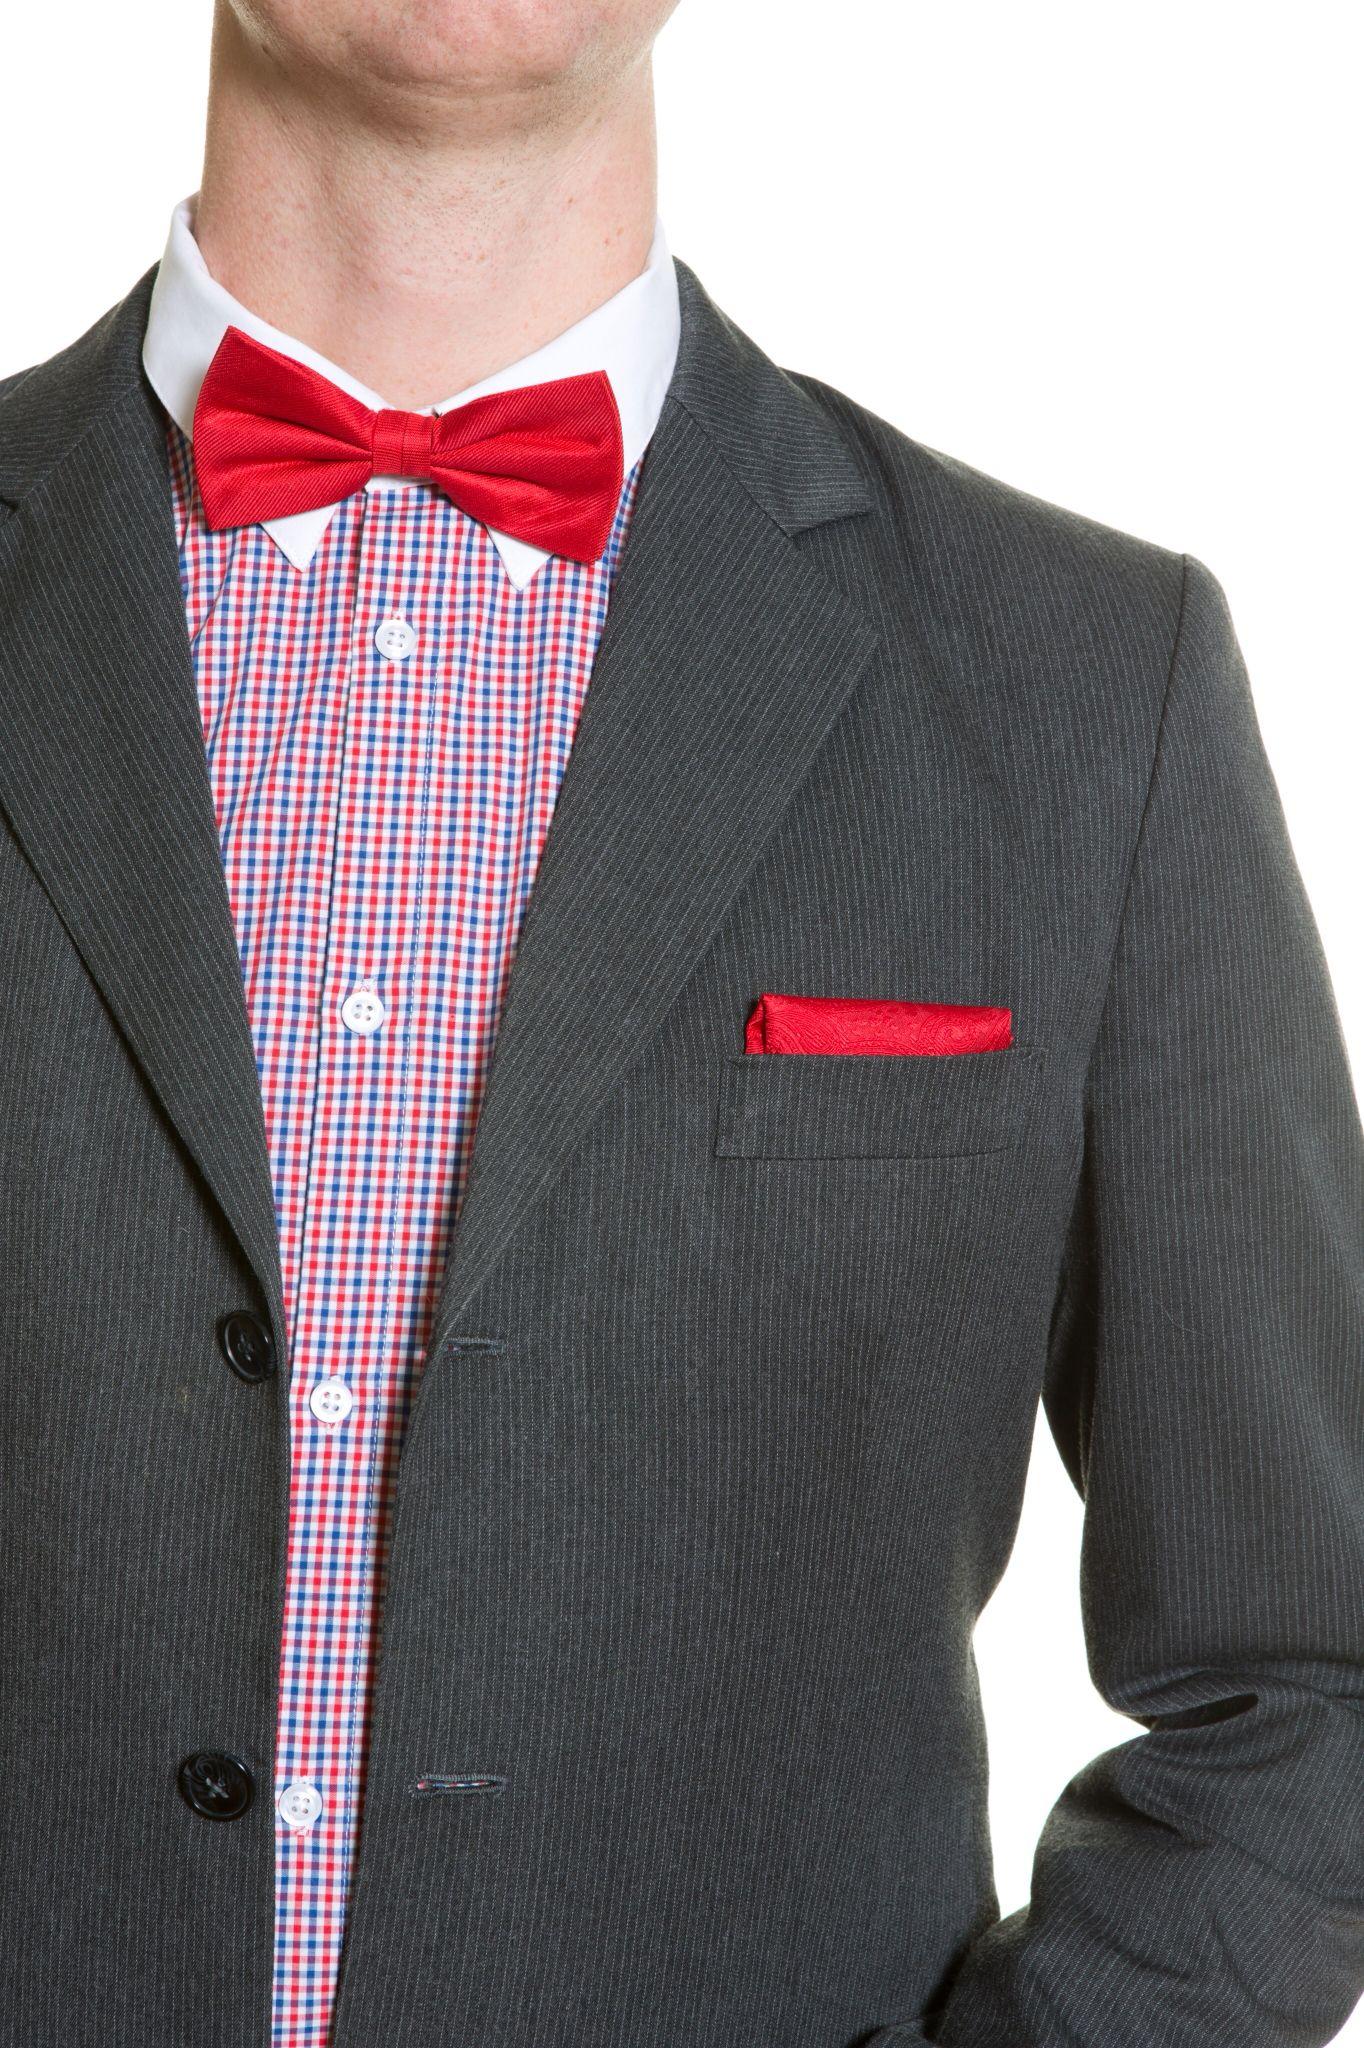 Handkerchief from Tieroom, Notch RANDAL, red paisley pattern Notch